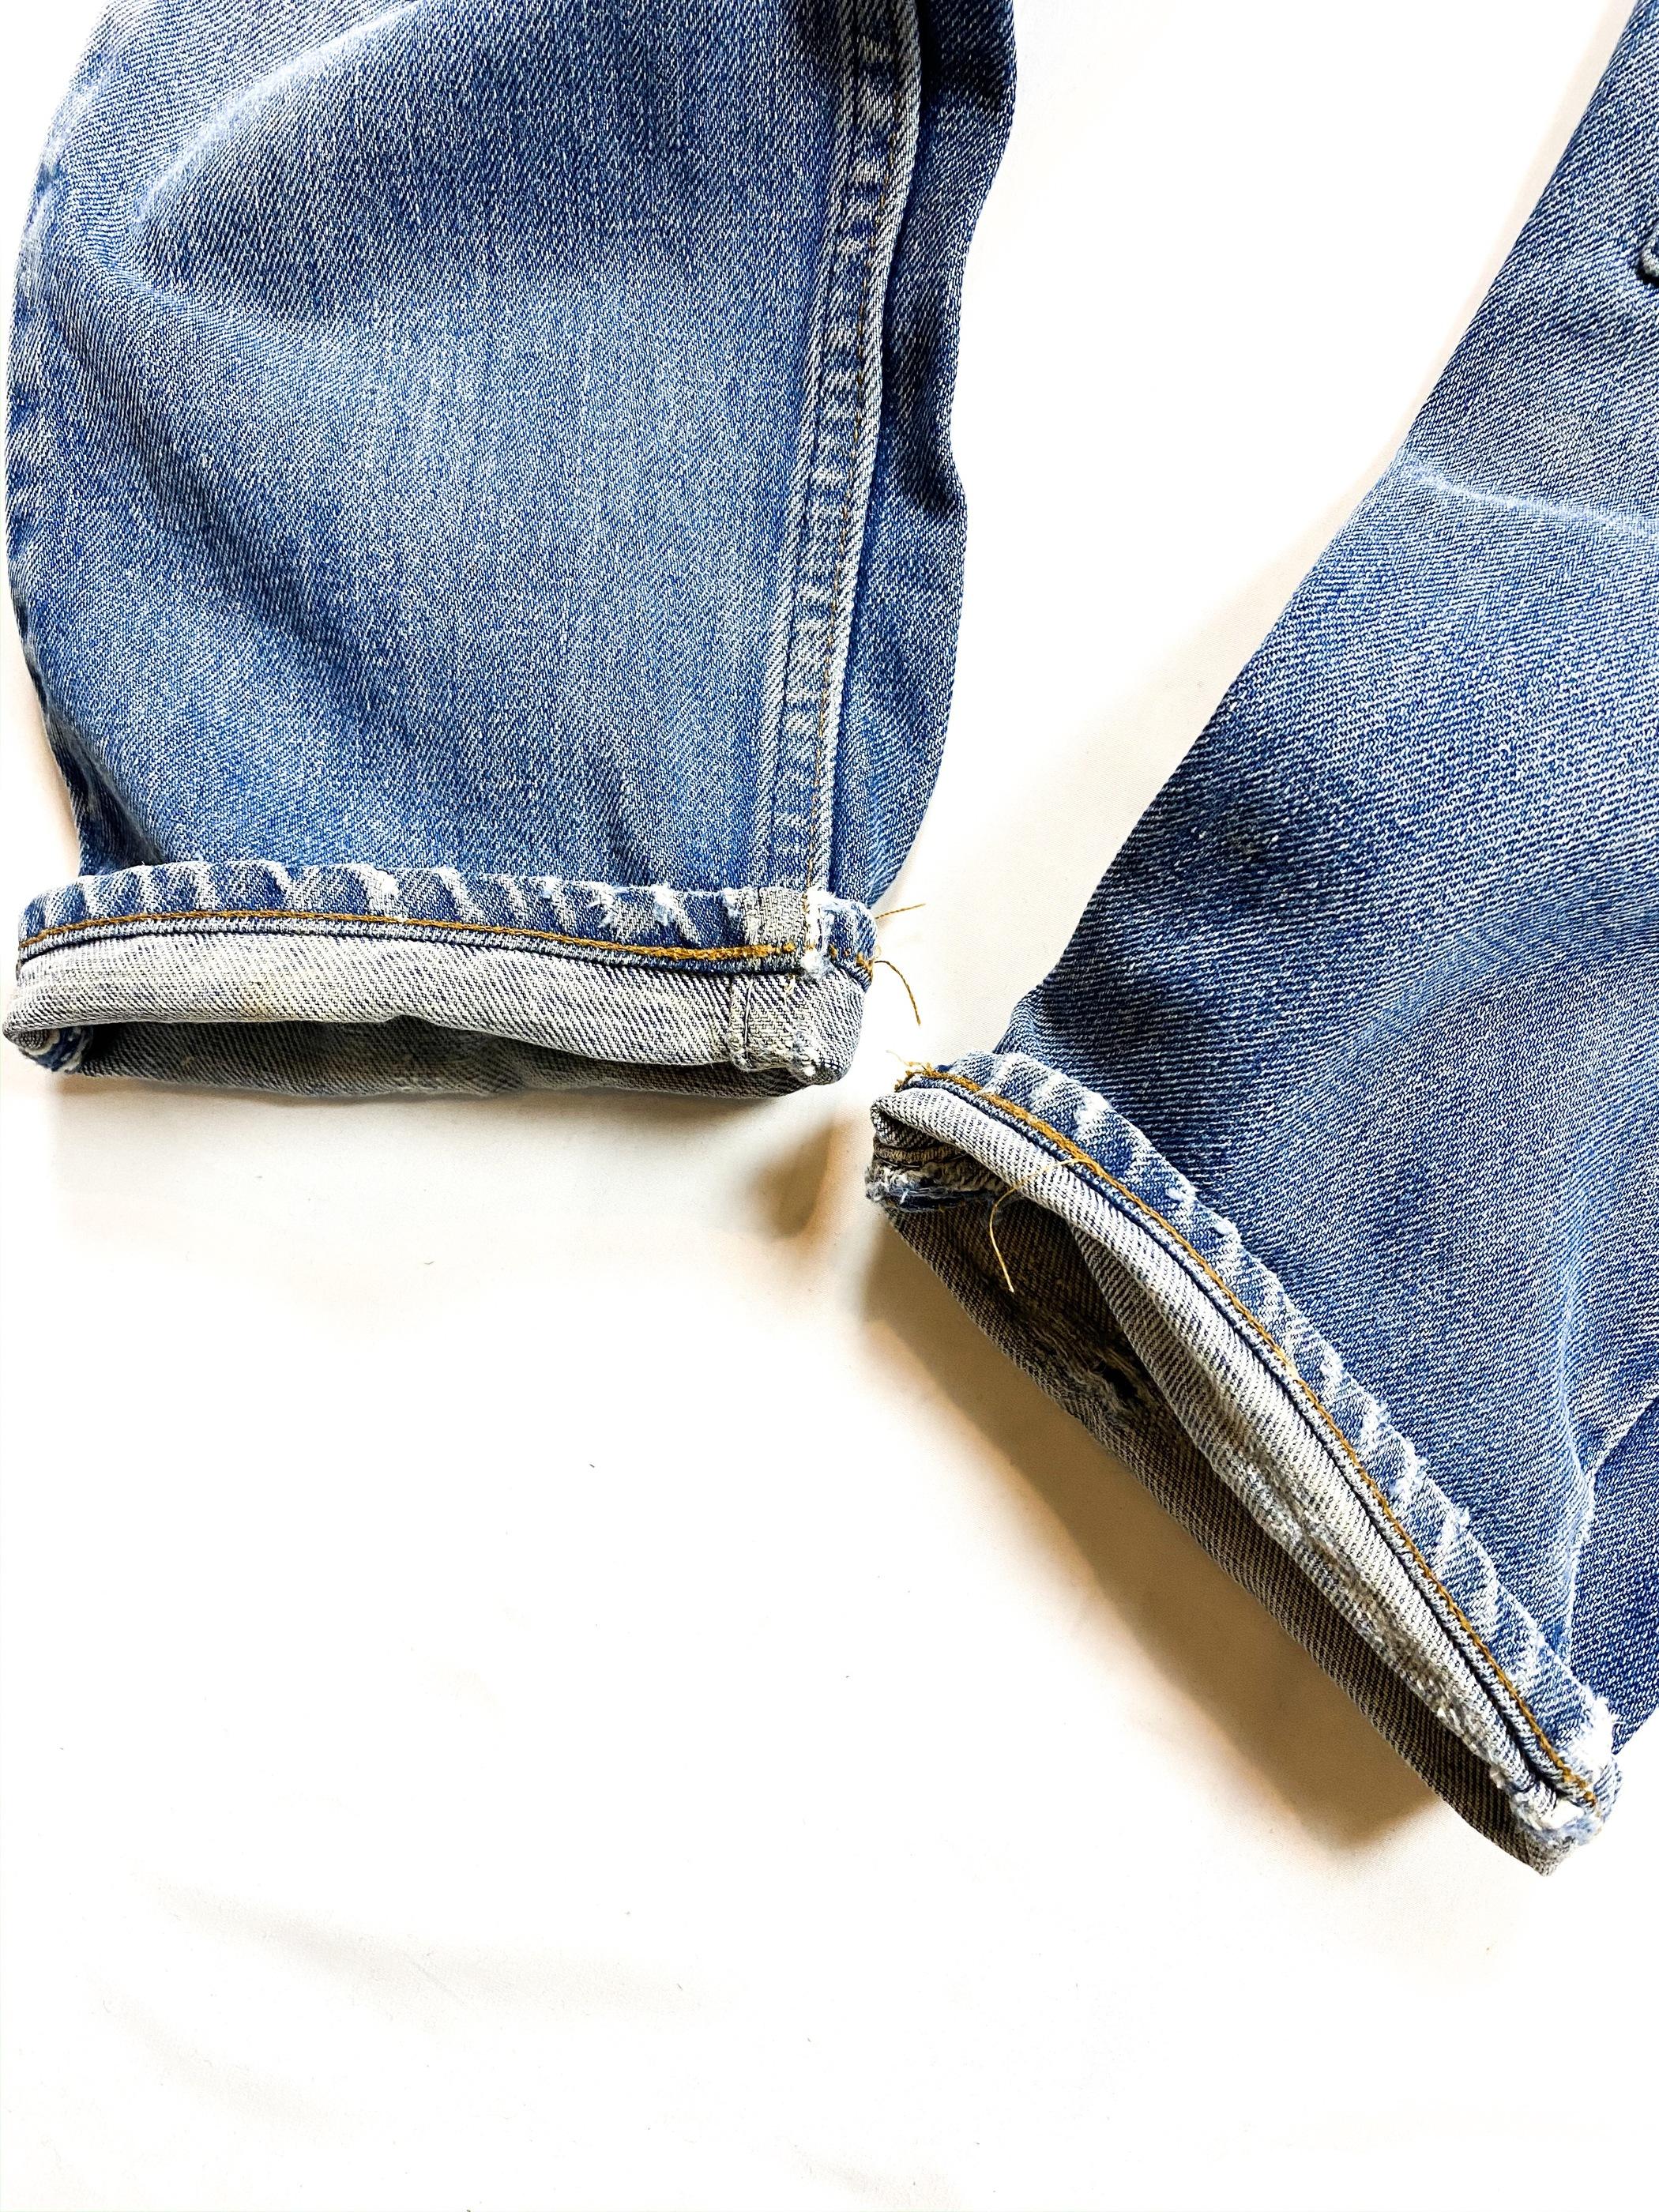 70's  Levi's 505 remake blue denim pants